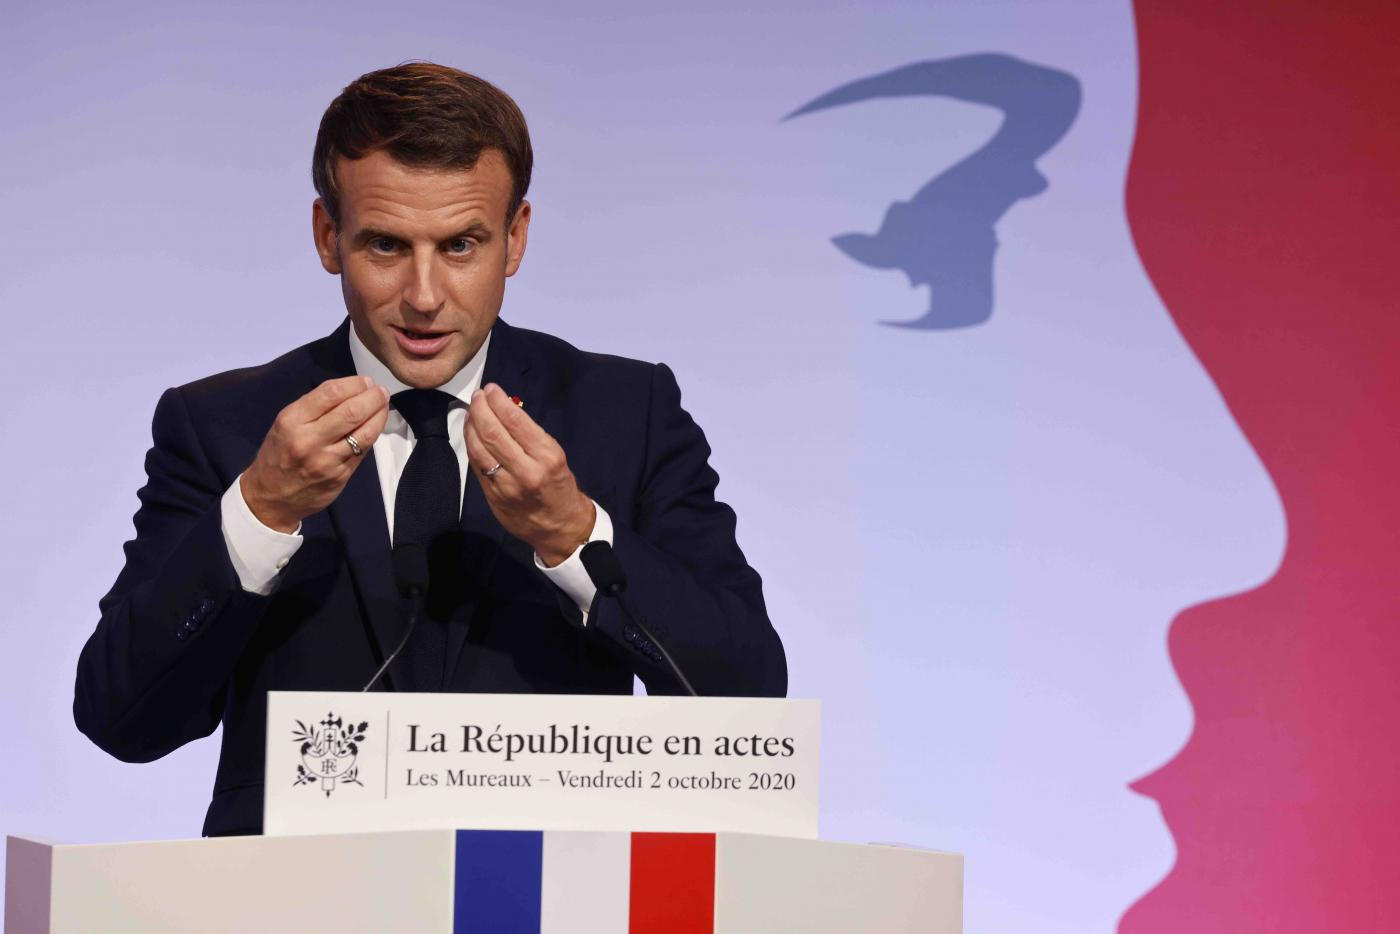 'Dictatorial': Turkey slams Macron's new Islamic separatism law